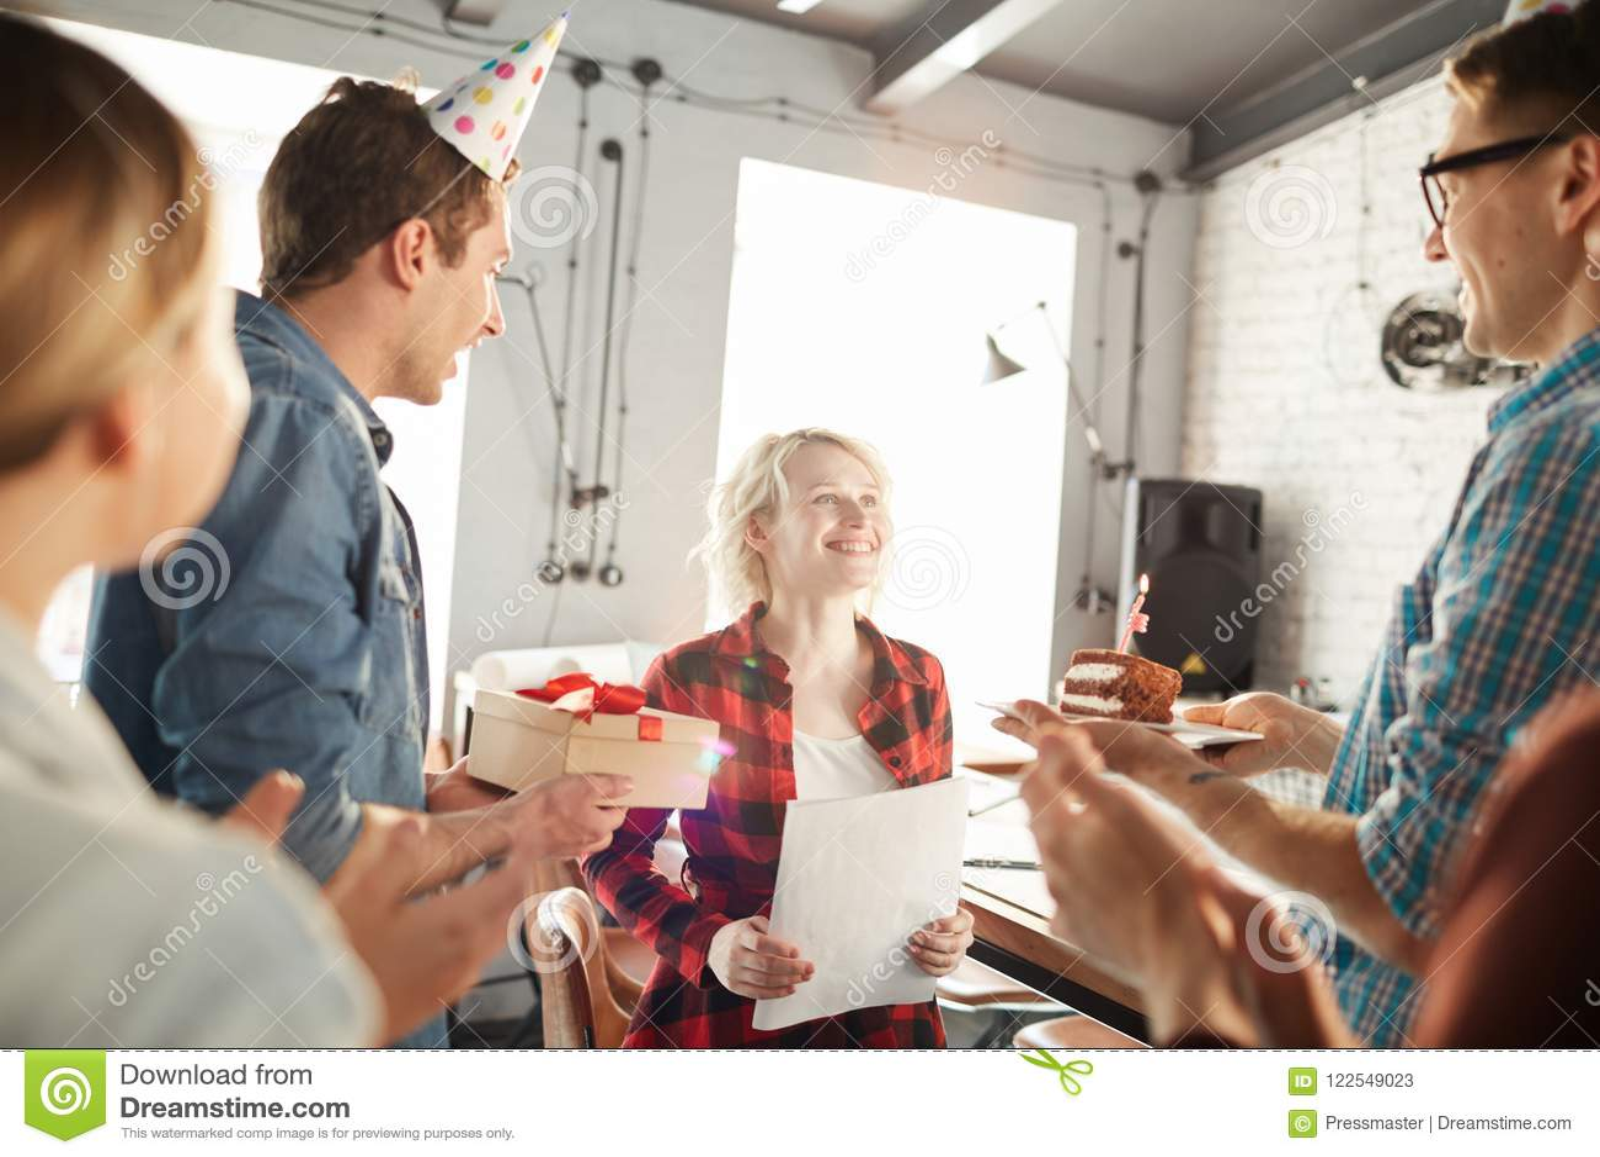 Celebrating Birthday In Office Stock Image Image Of Blonde